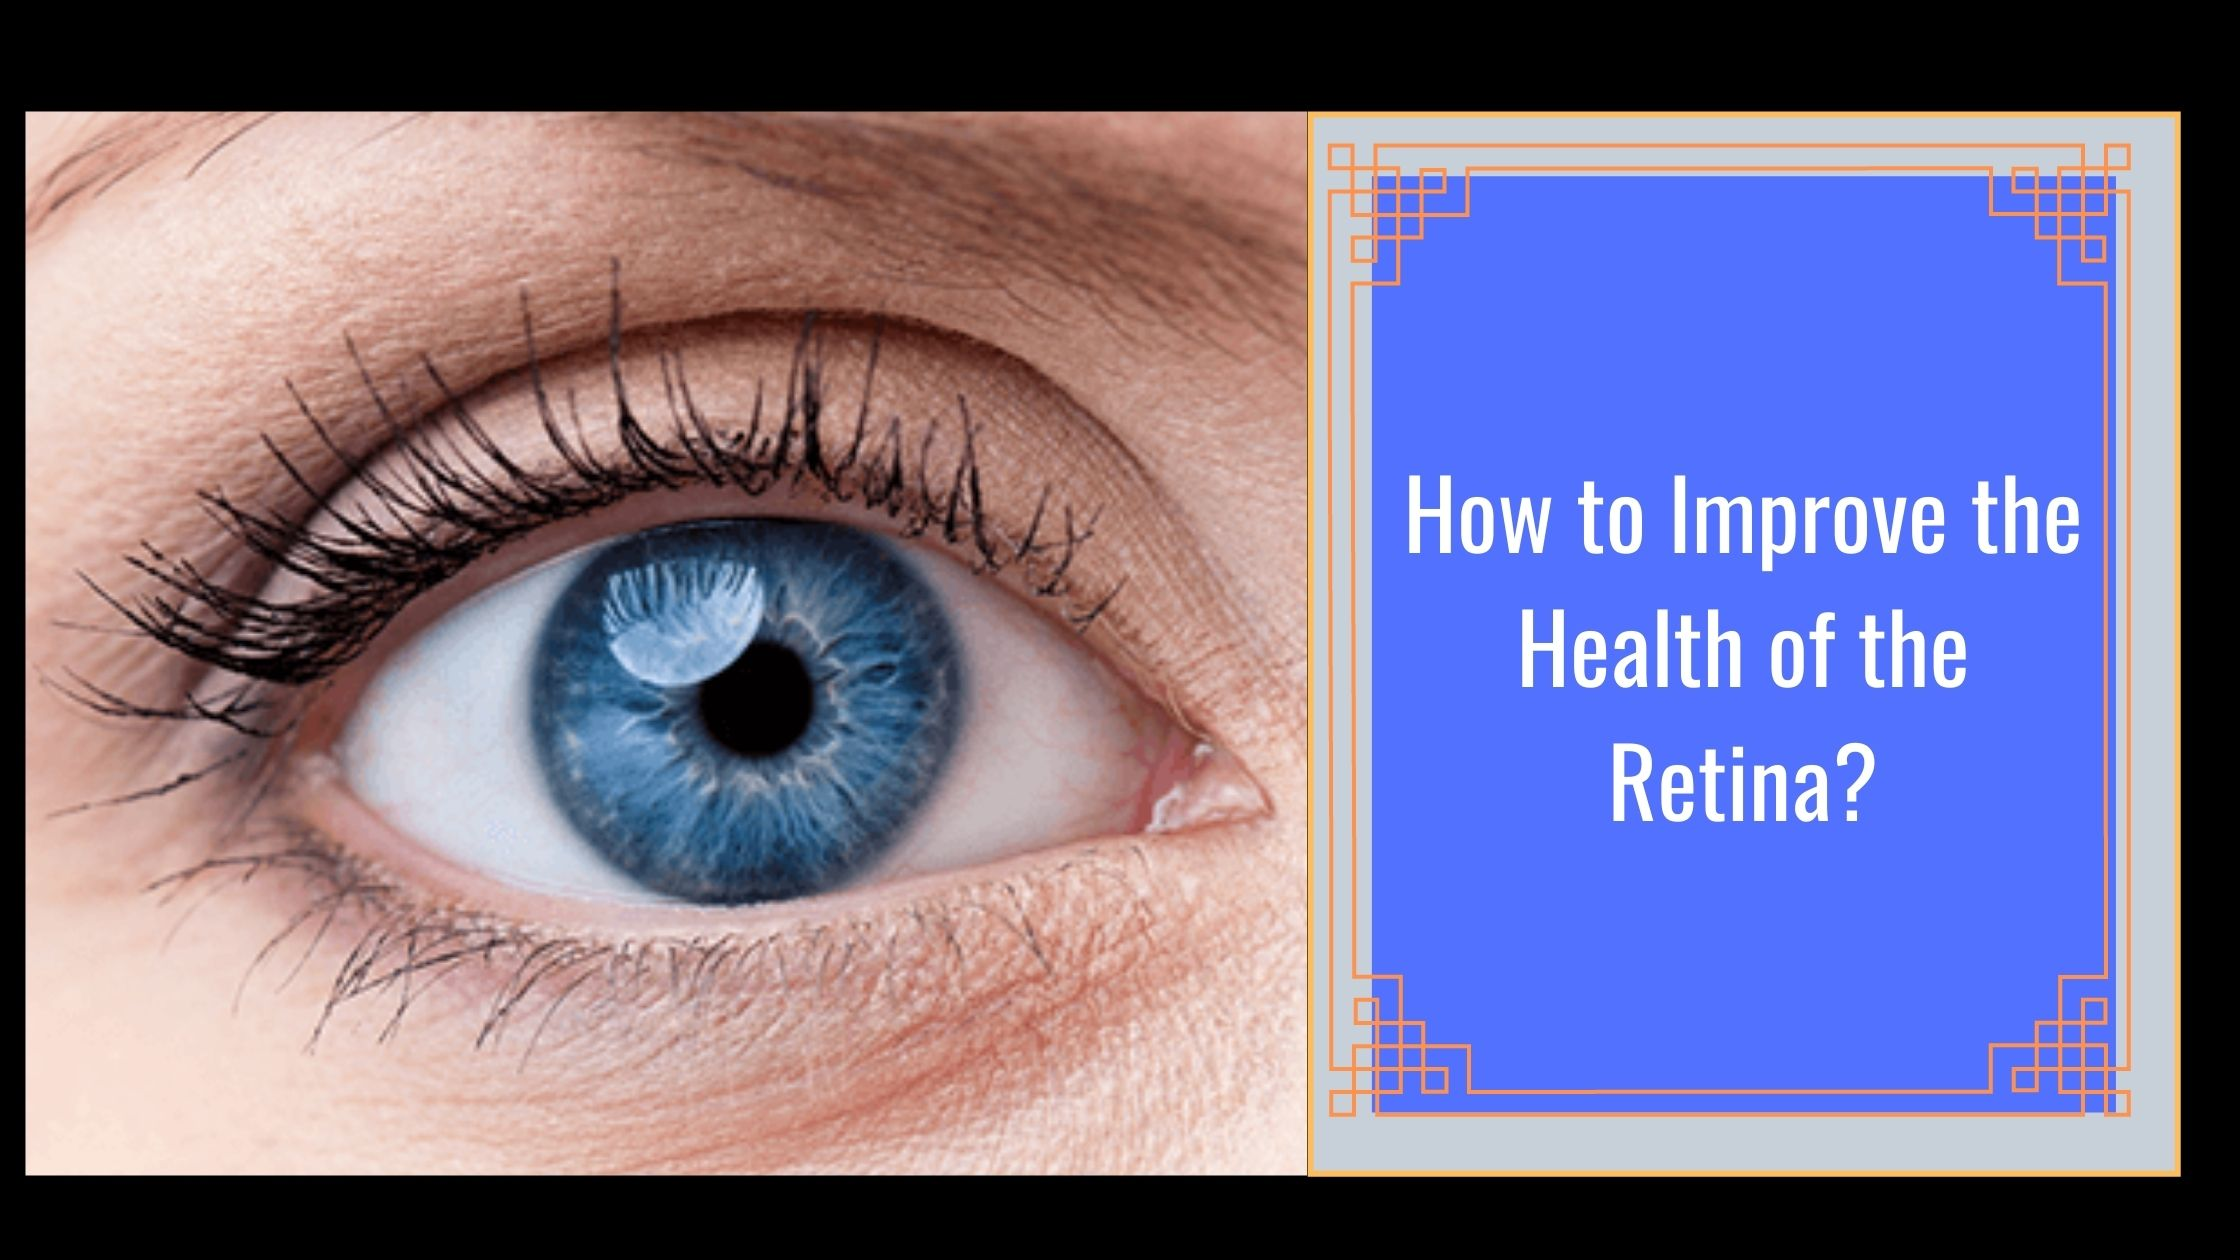 How to Improve the Health of the Retina?